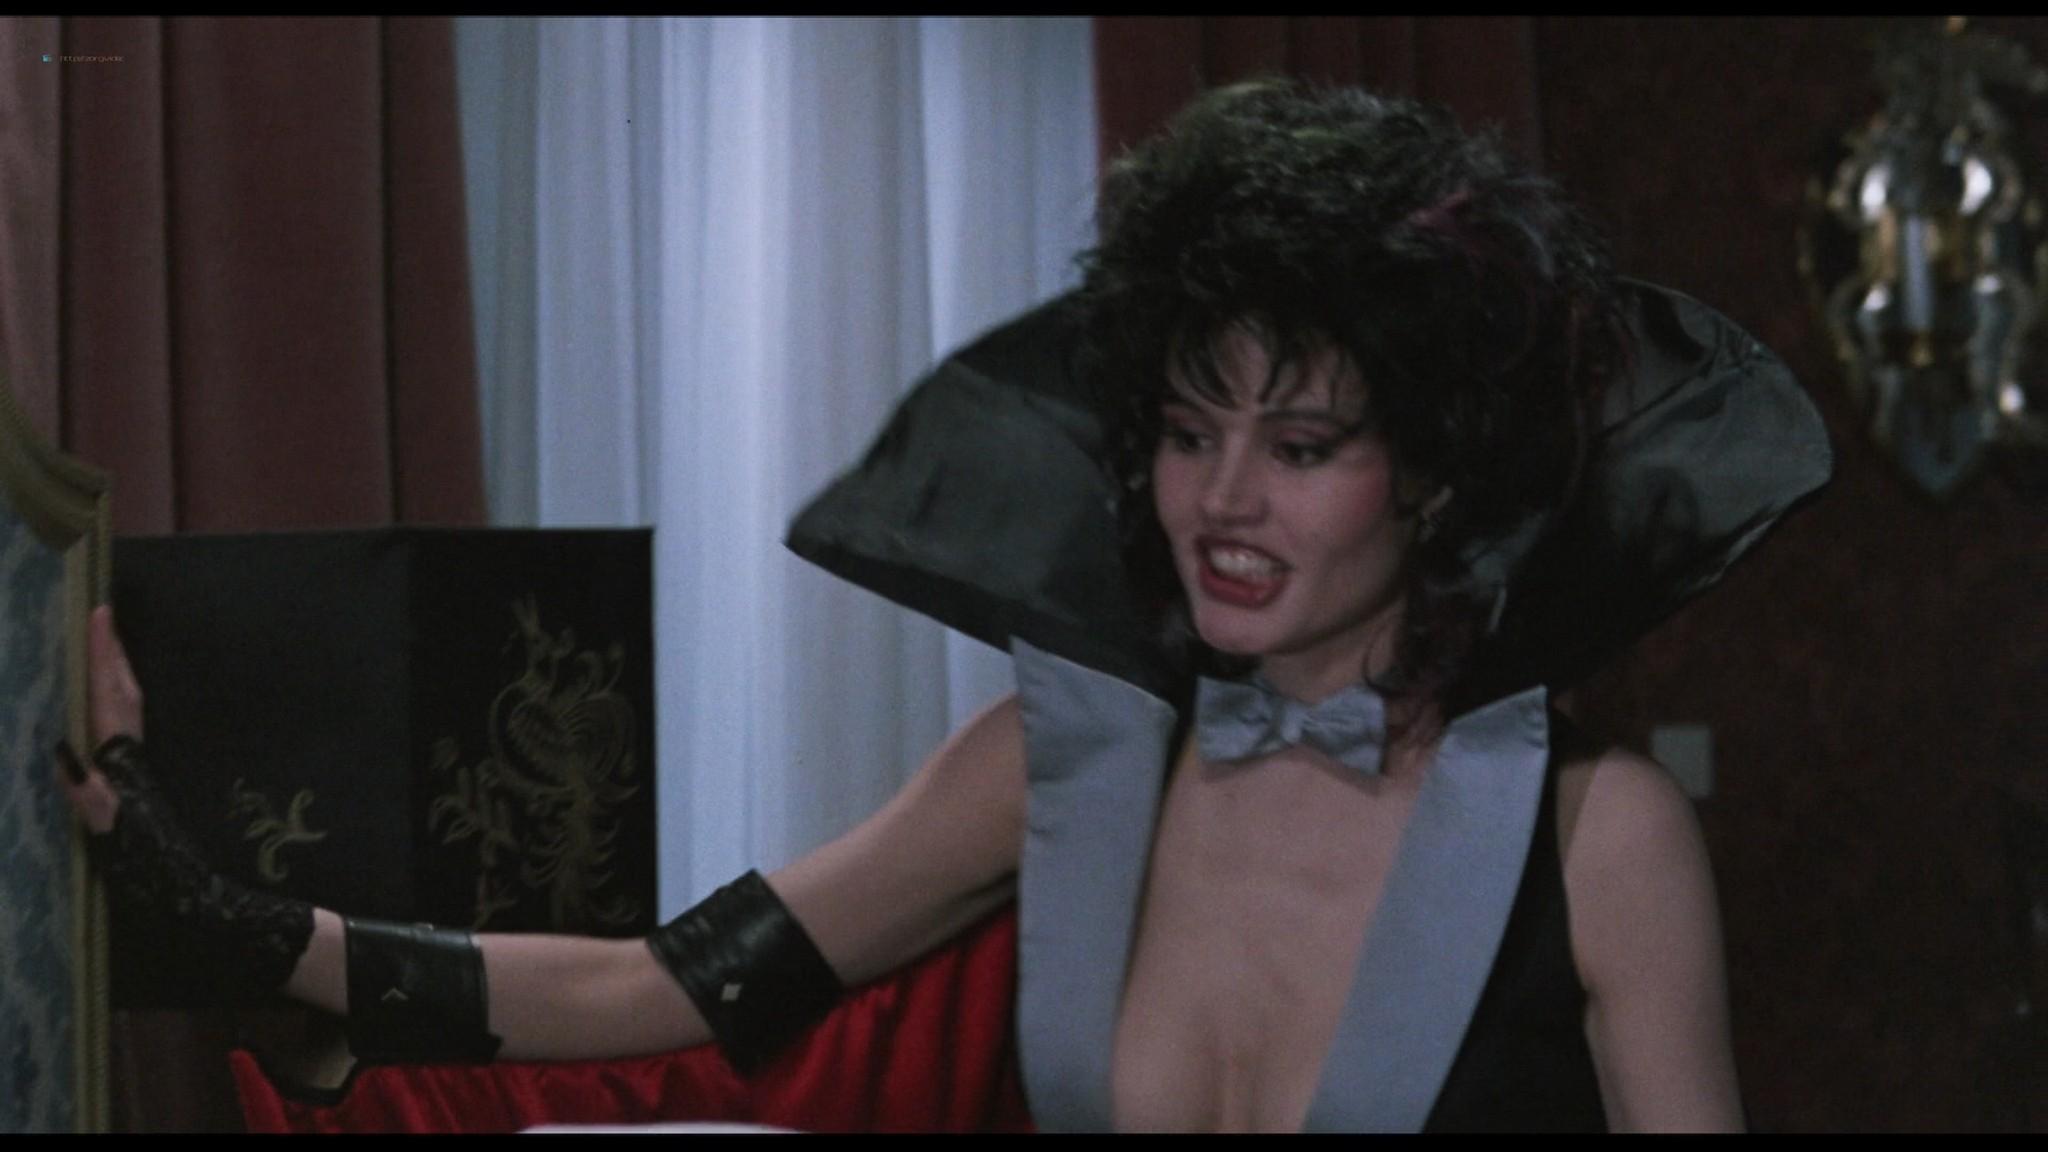 Geena Davis hot and sexy Ksenia Prohaska sexy - Transylvania 6-5000 (1985) HD 1080p BluRay (17)